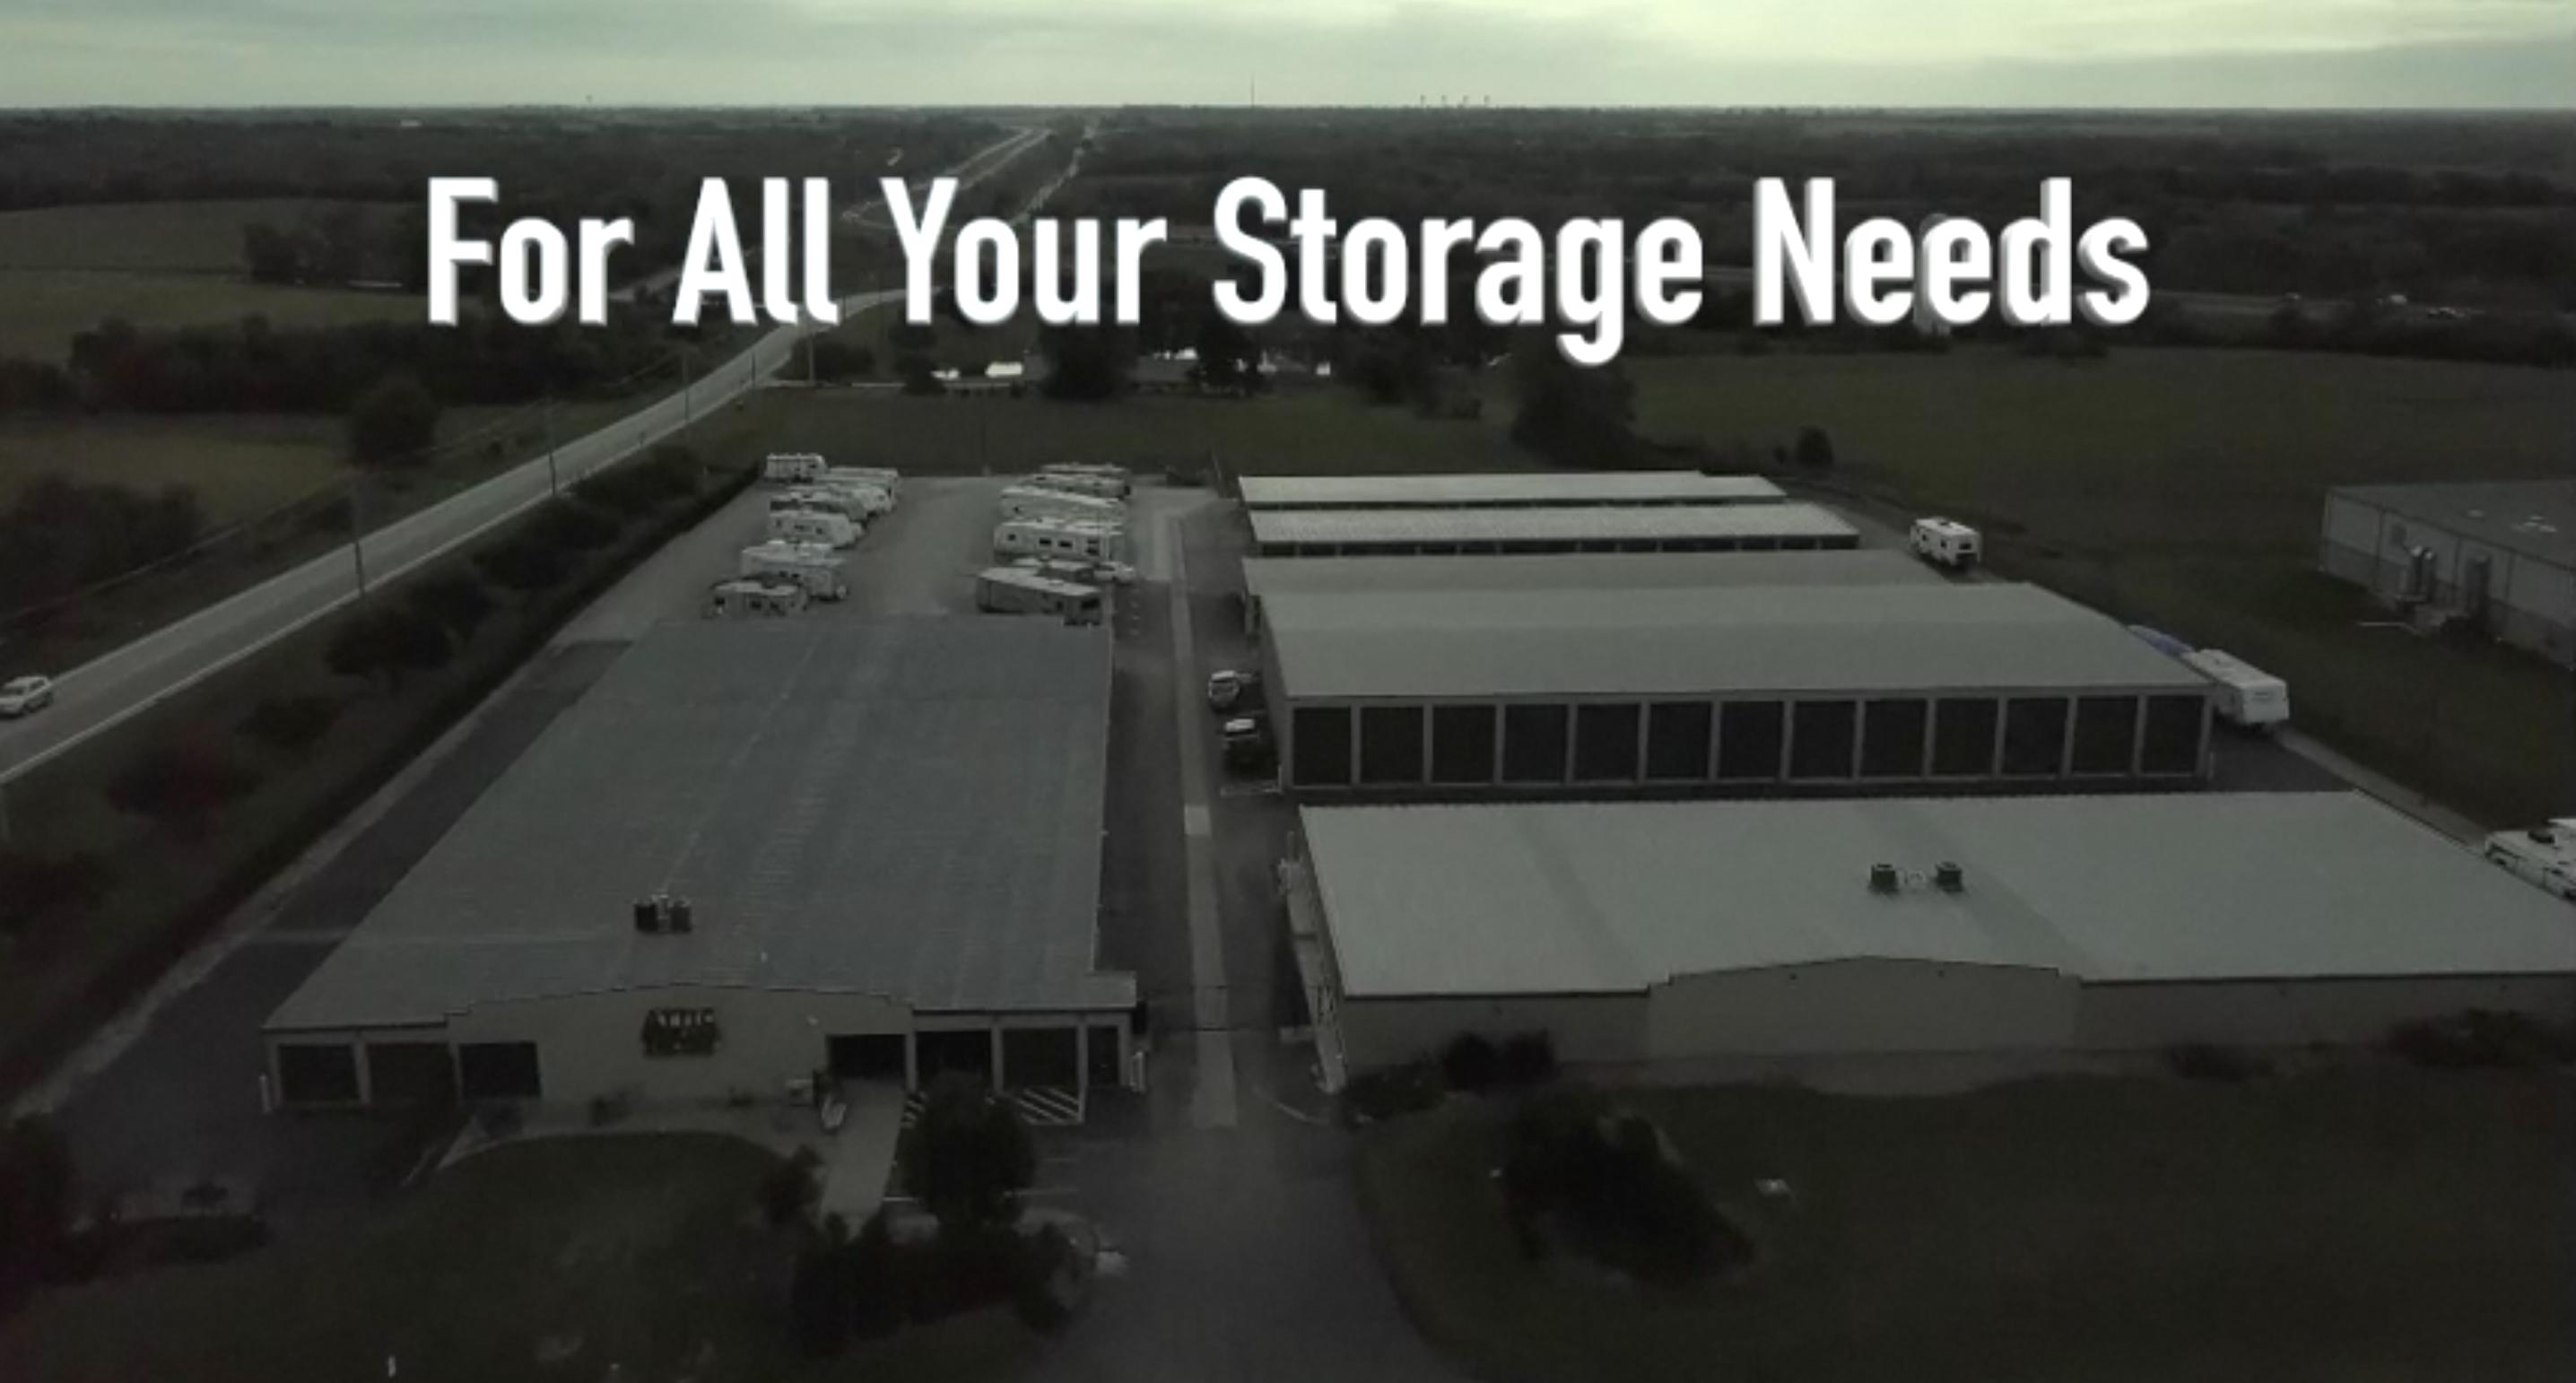 storage needs in Eudora, KS